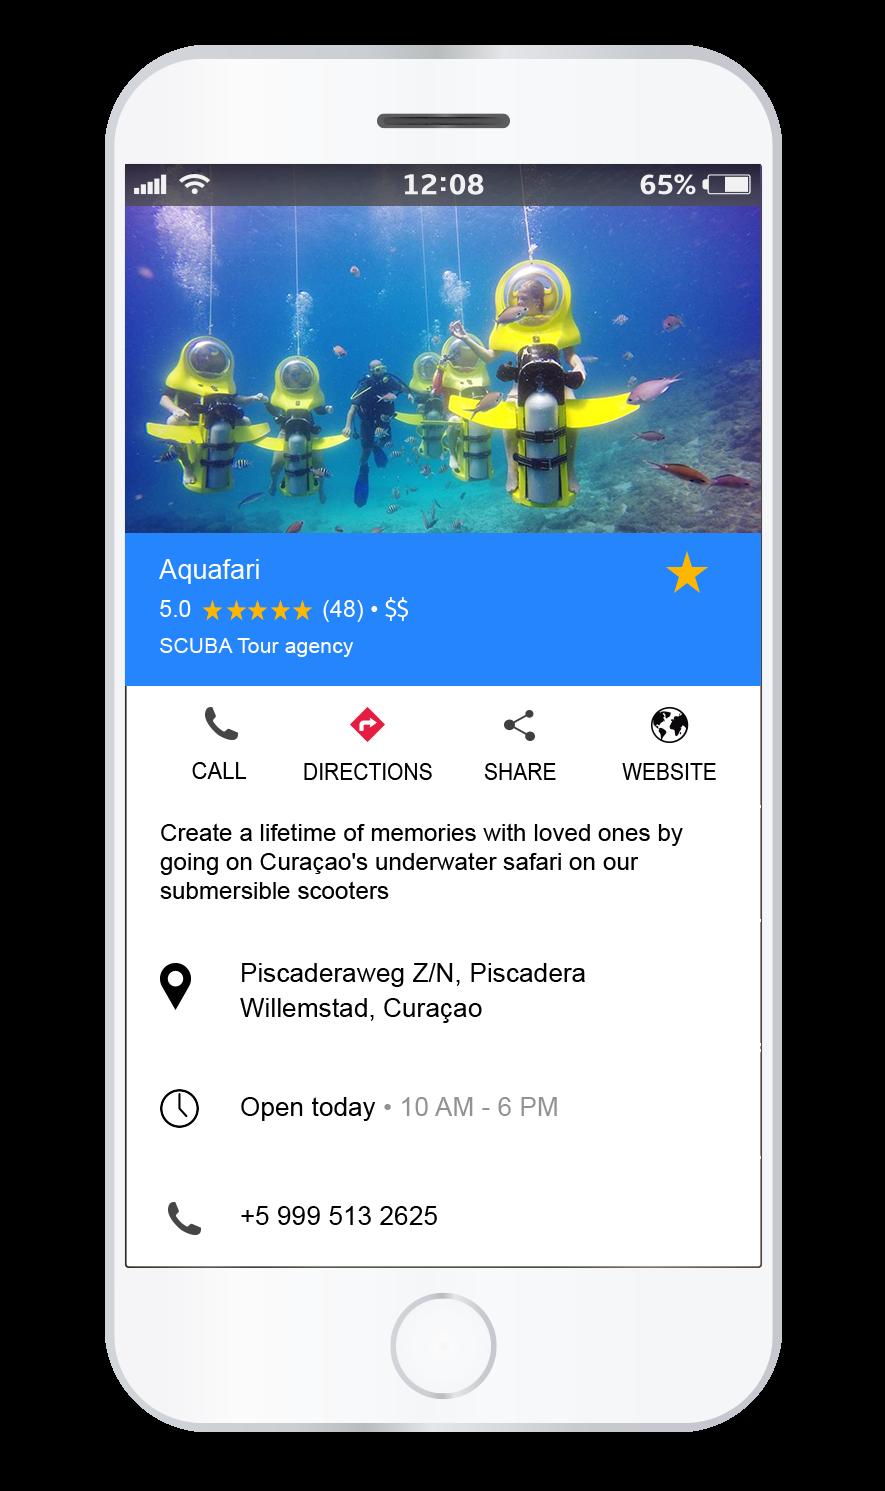 Curacao_OTM_Phone-Aquafari